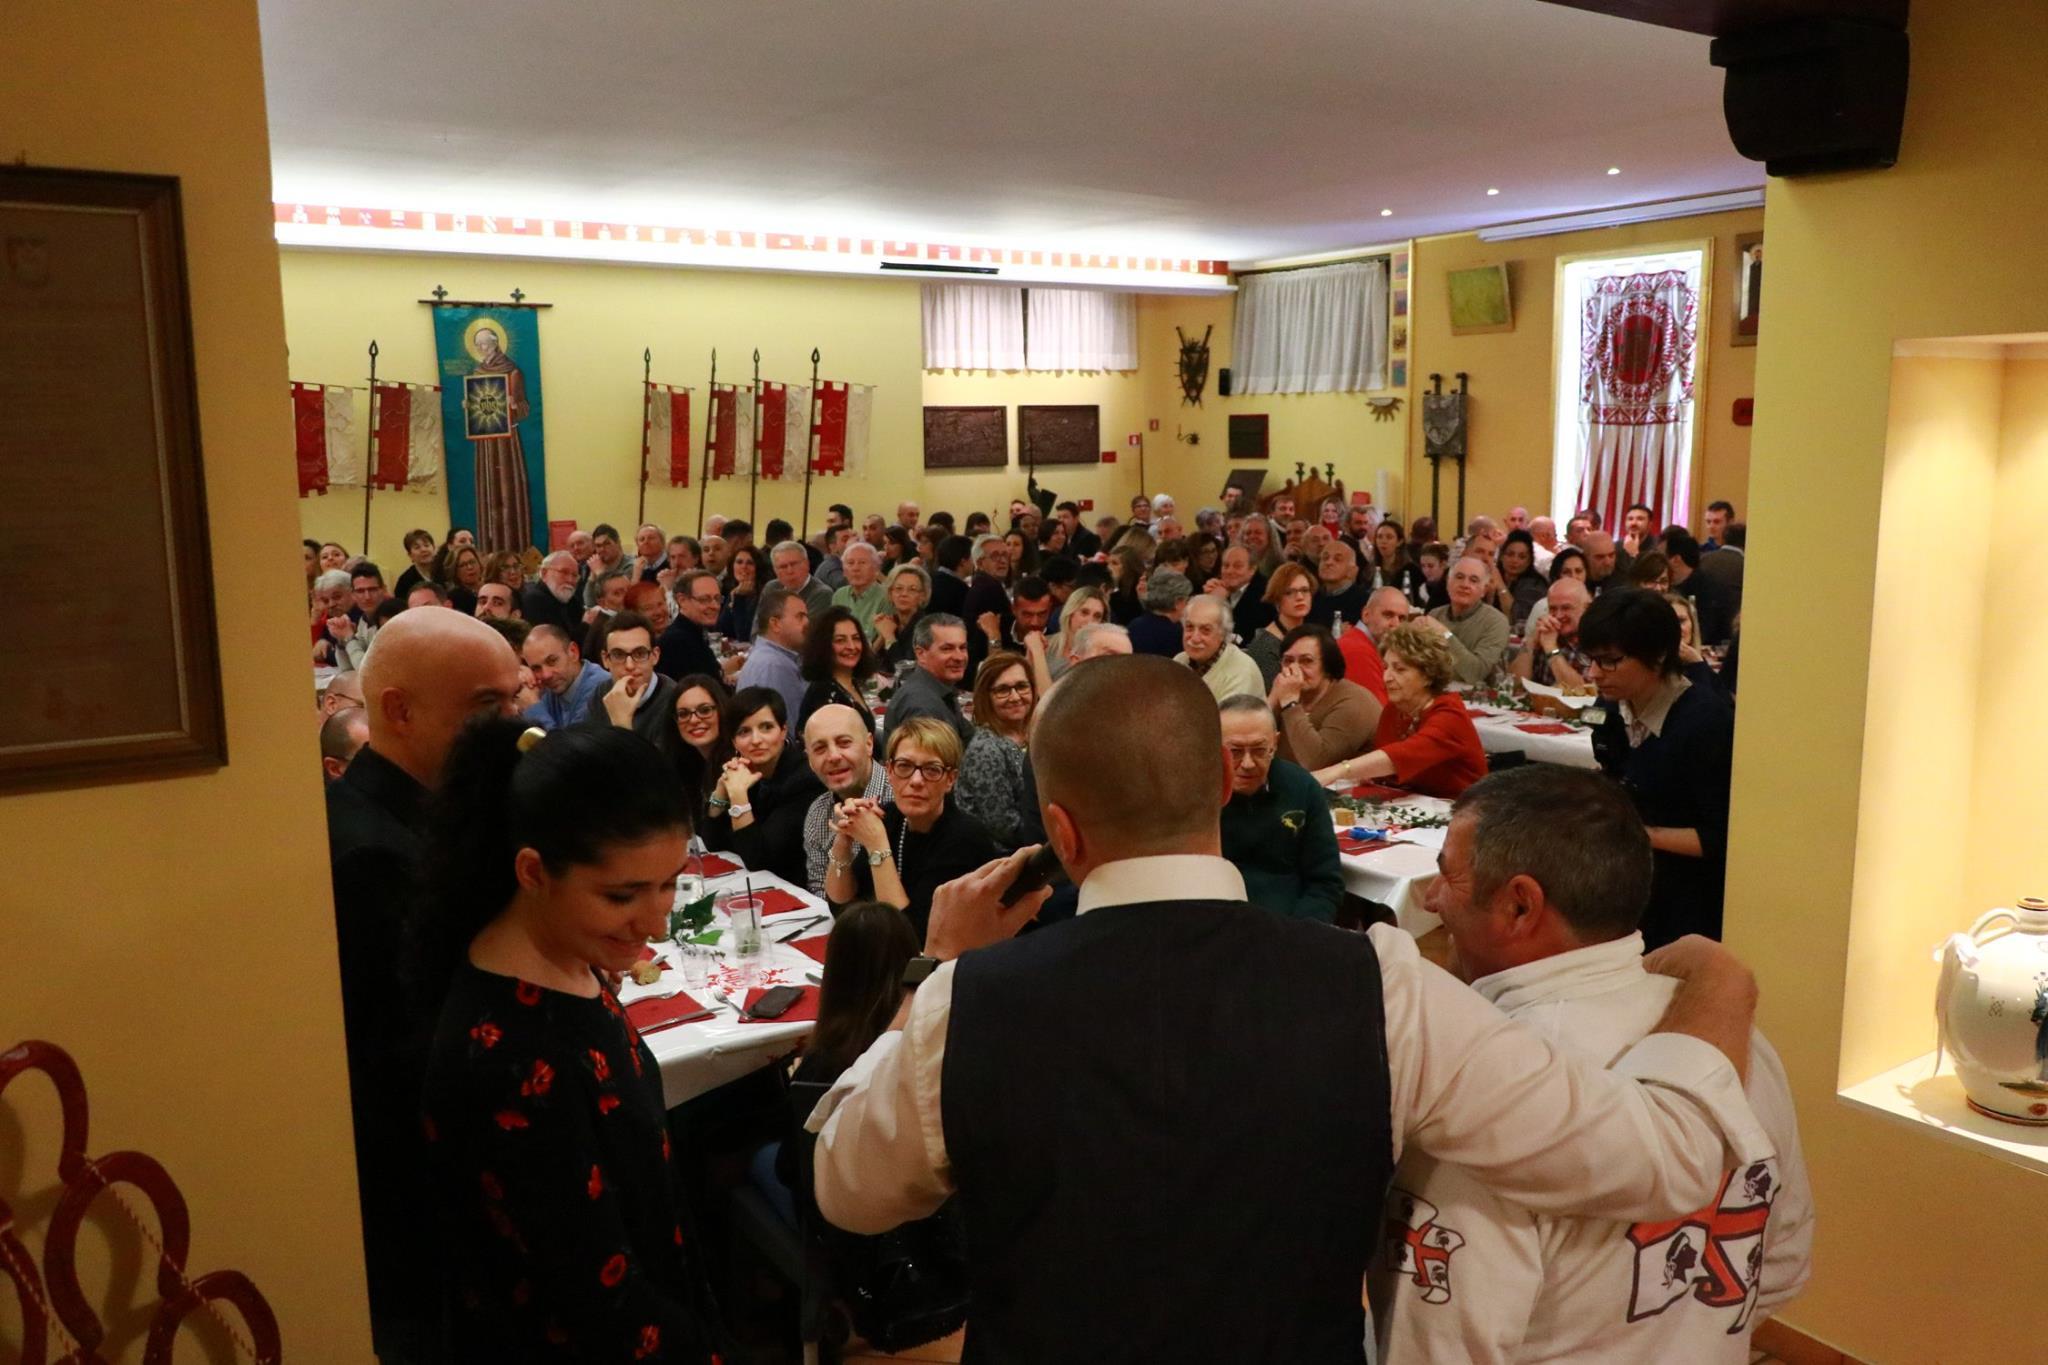 NBS-Cena ai Sapori di Sardegna - 16 2 19 (9)